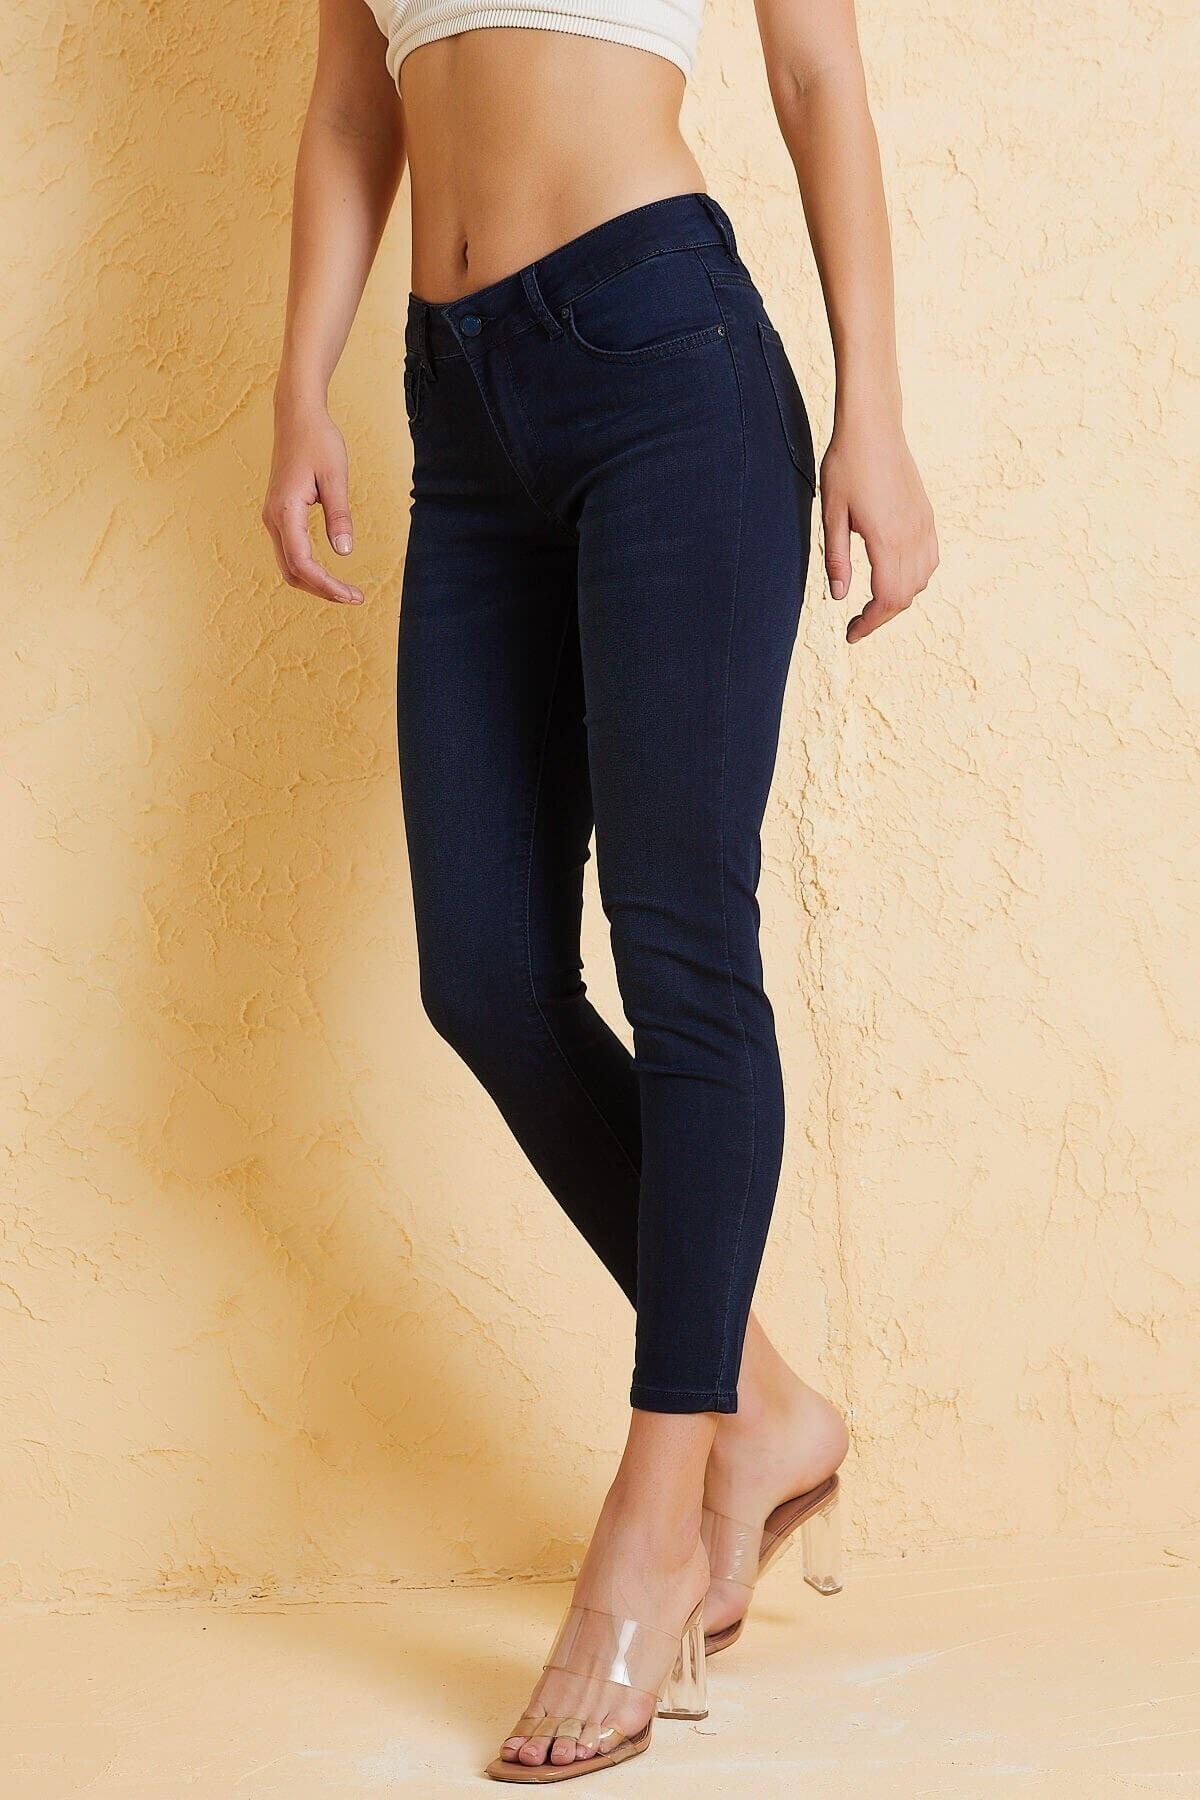 Twister Jeans Kadın Slim Fit Orta Bel Pantolon Lıma 9046-78 Mavı 2